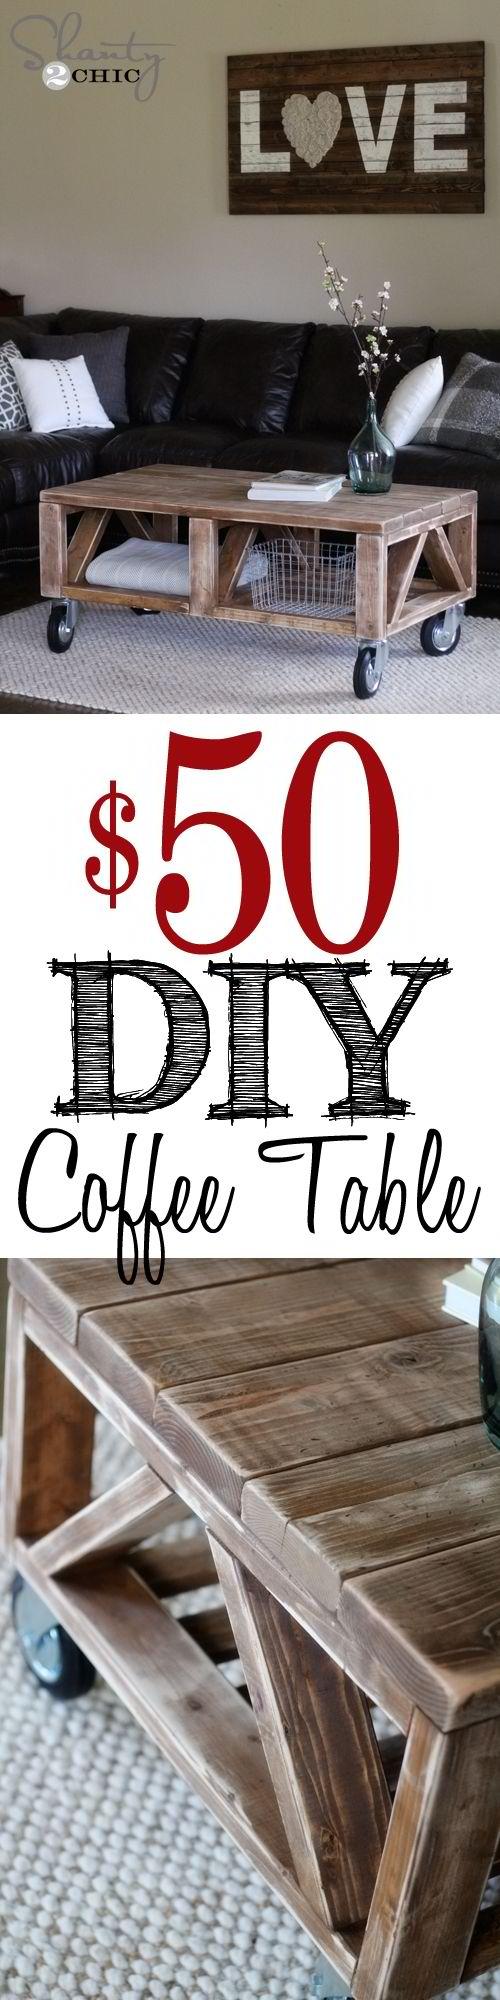 Coffee Table DIY